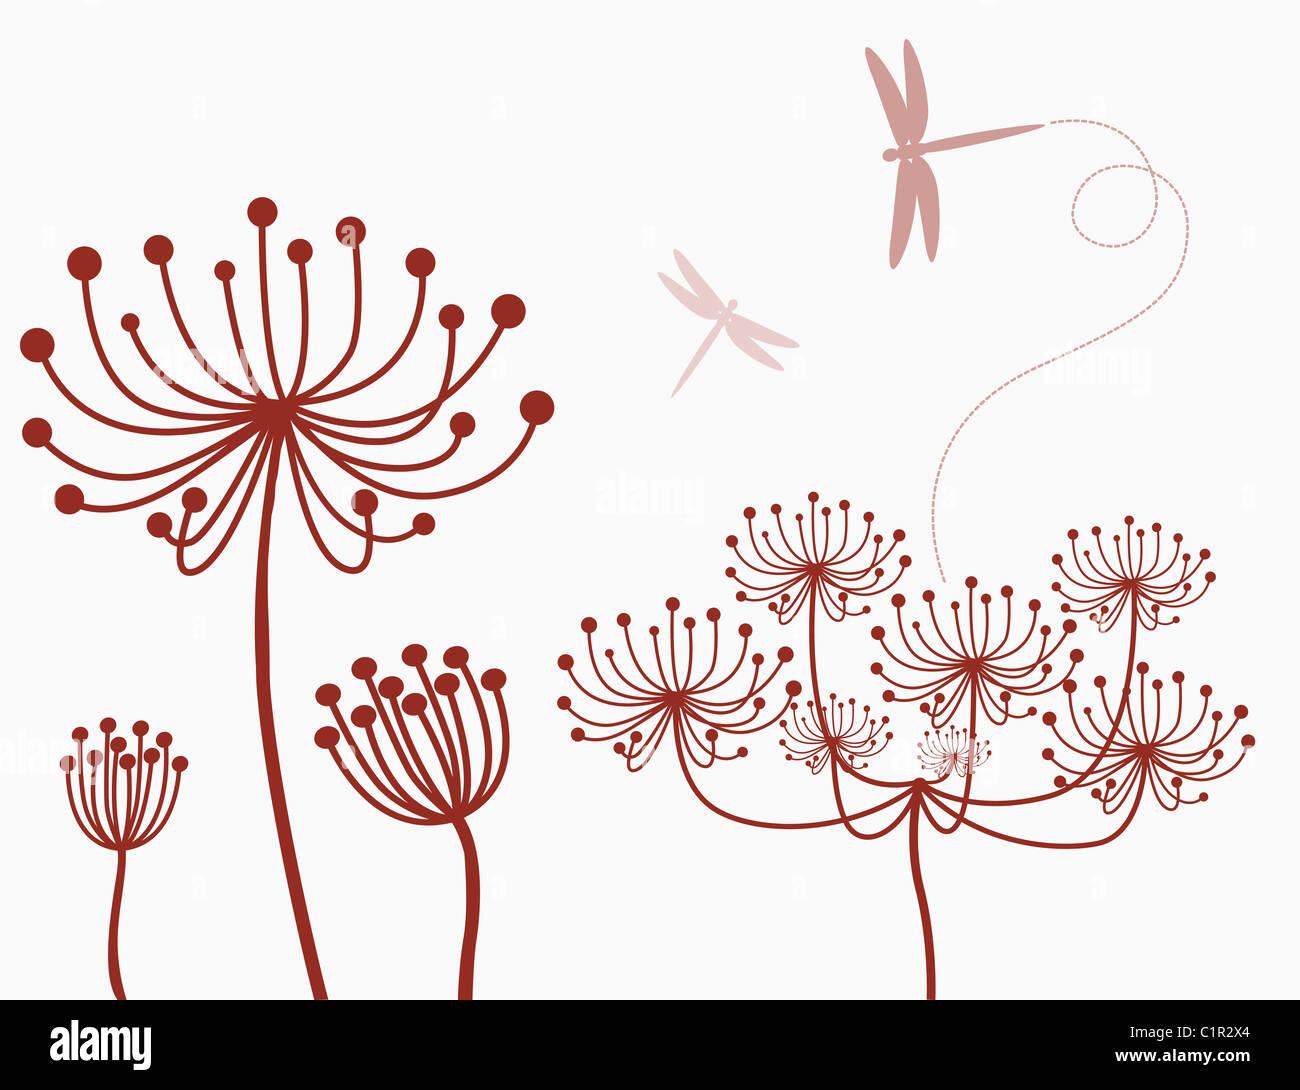 dragonflies illustration - Stock Image